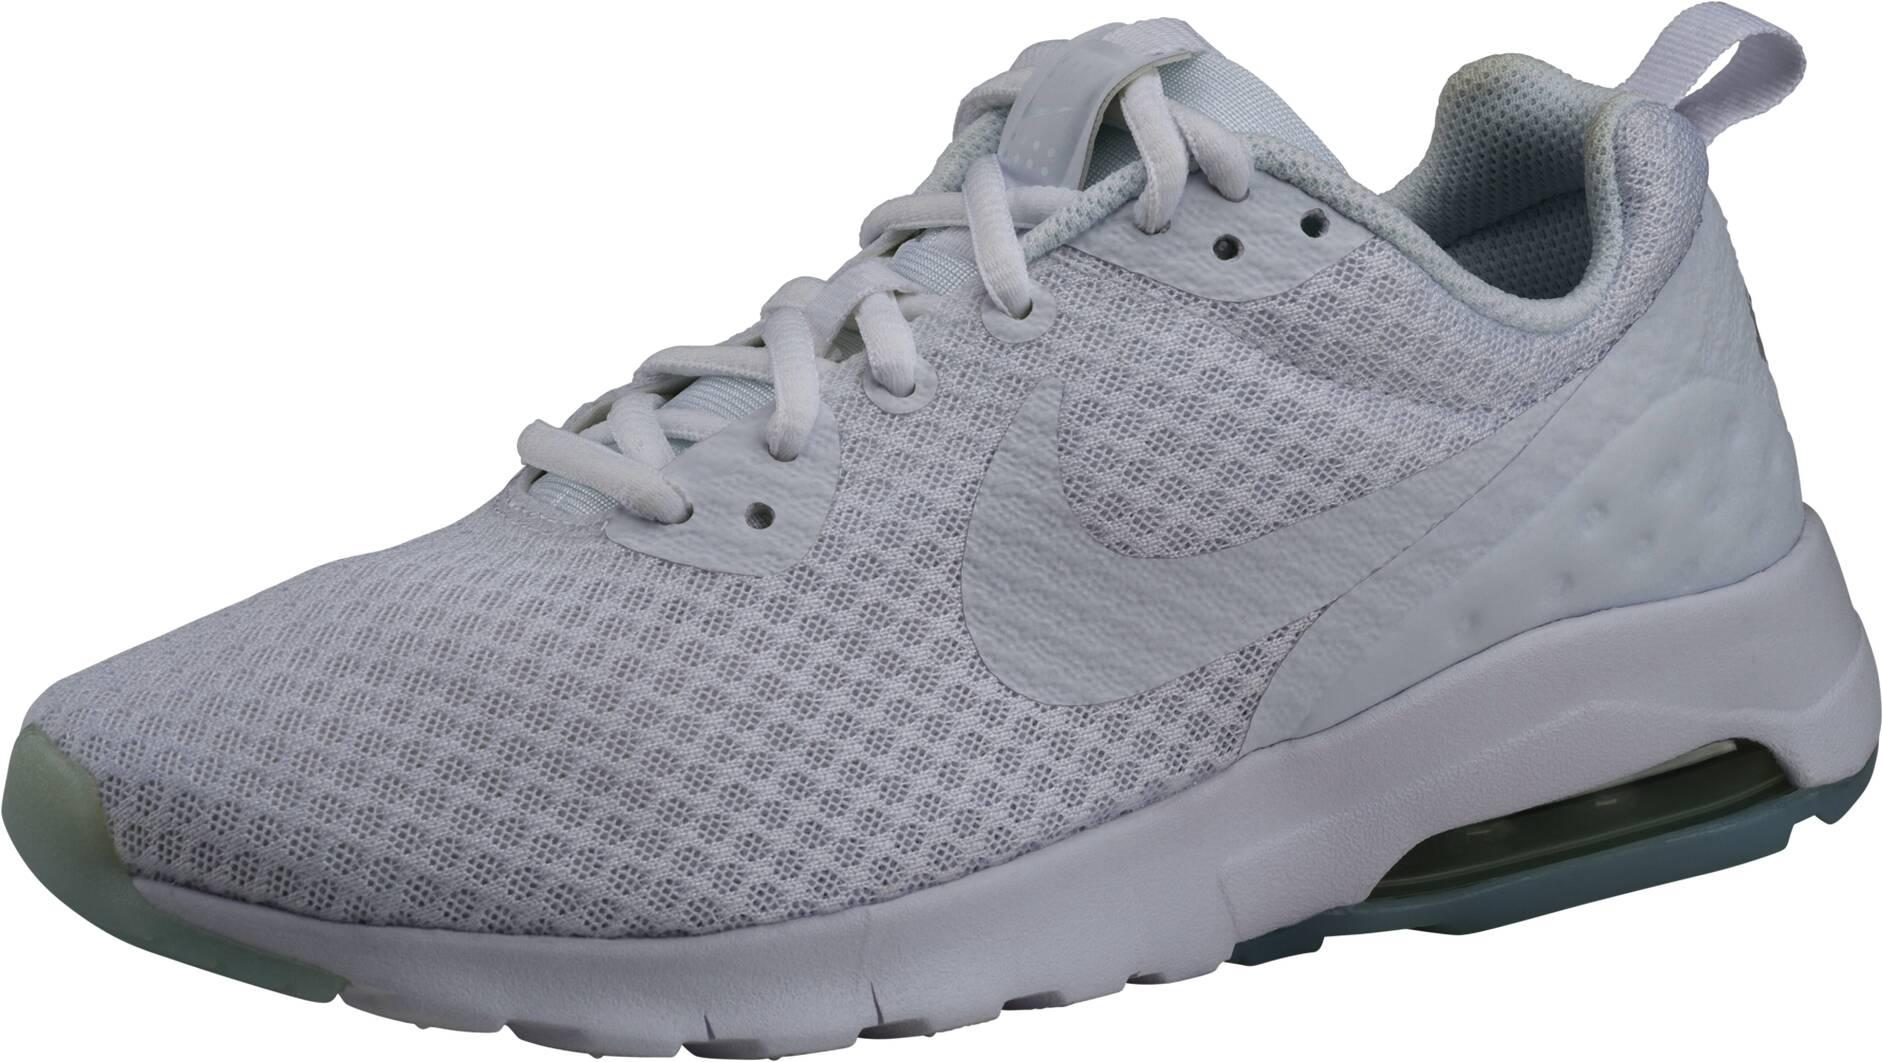 separation shoes 82403 d3136 ... promo code release 5d920 23d91 air max invigor intersportnike intersport  50d9f 10628